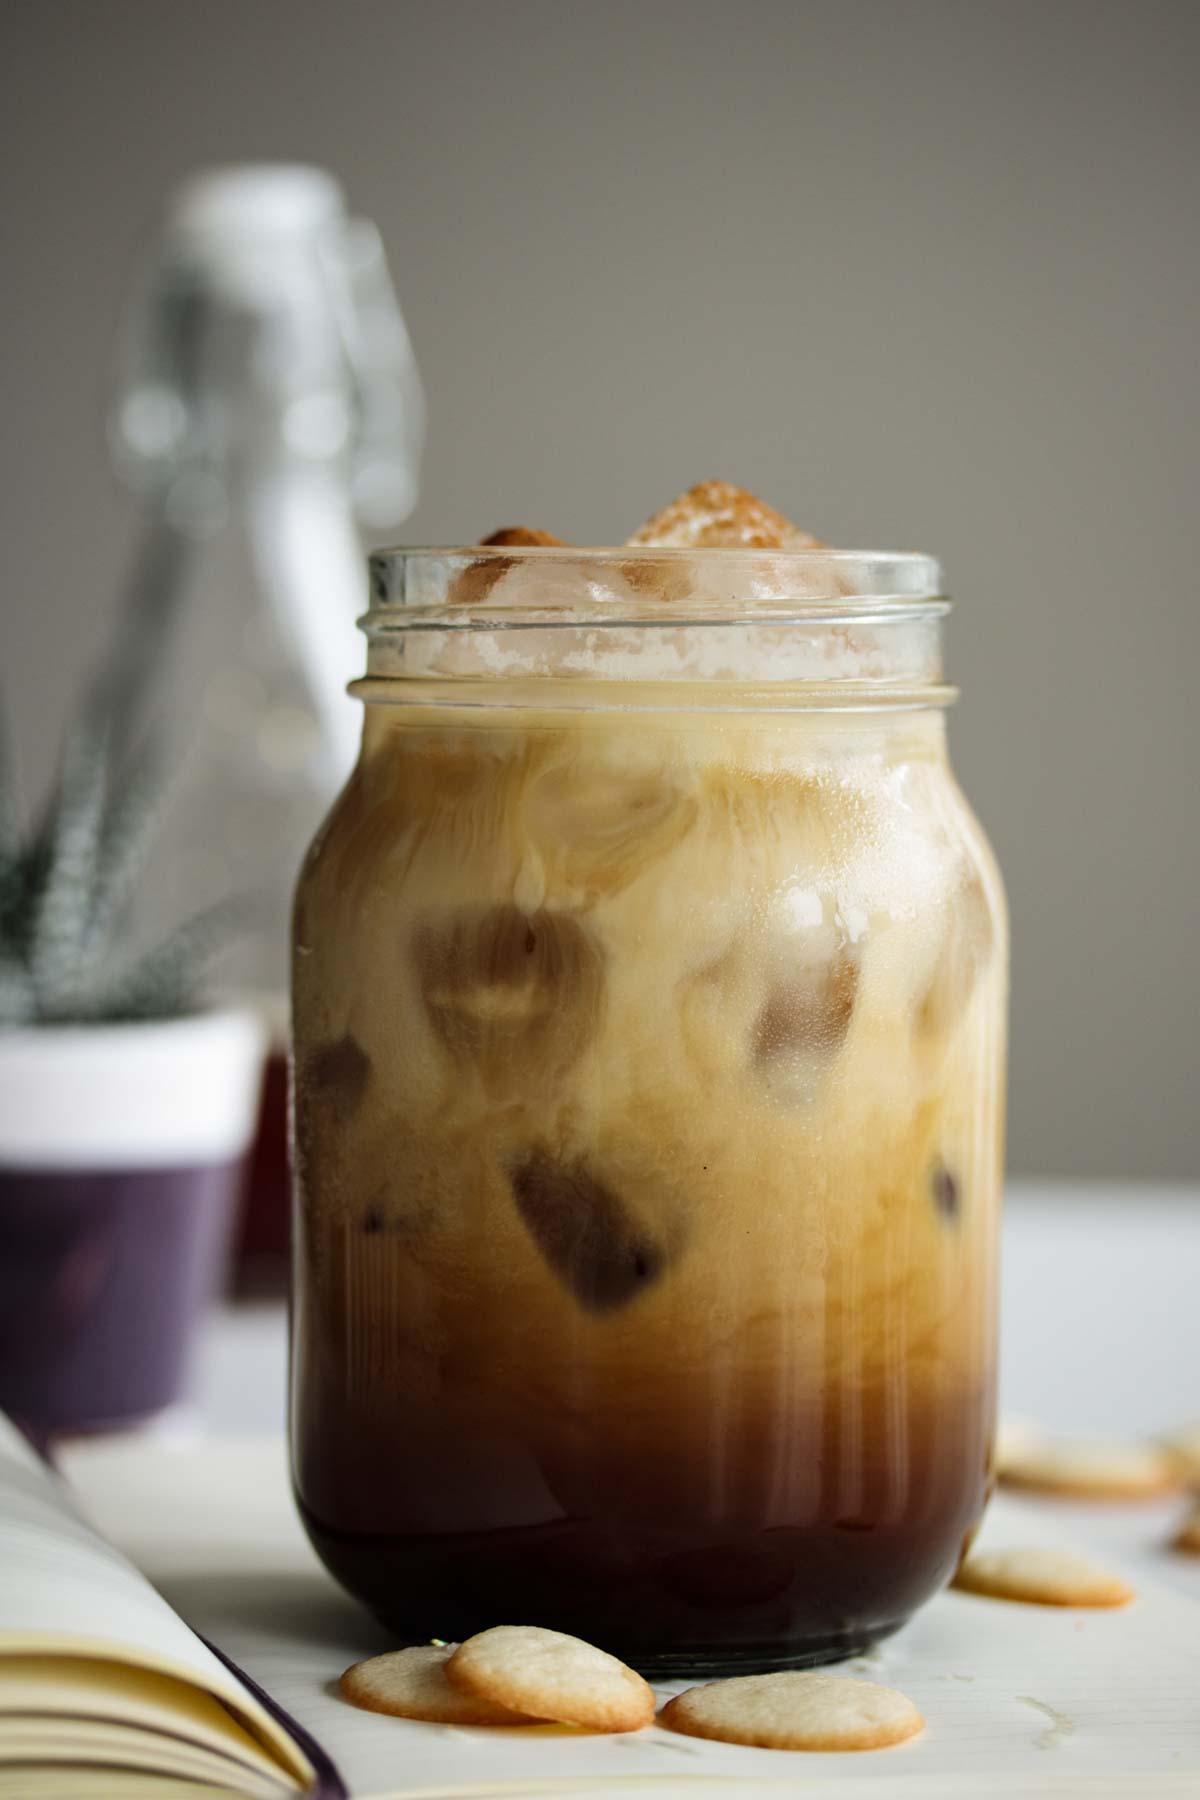 Starbucks copycat iced brown sugar oatmilk shaken espresso ready to drink, served in a mason jar.